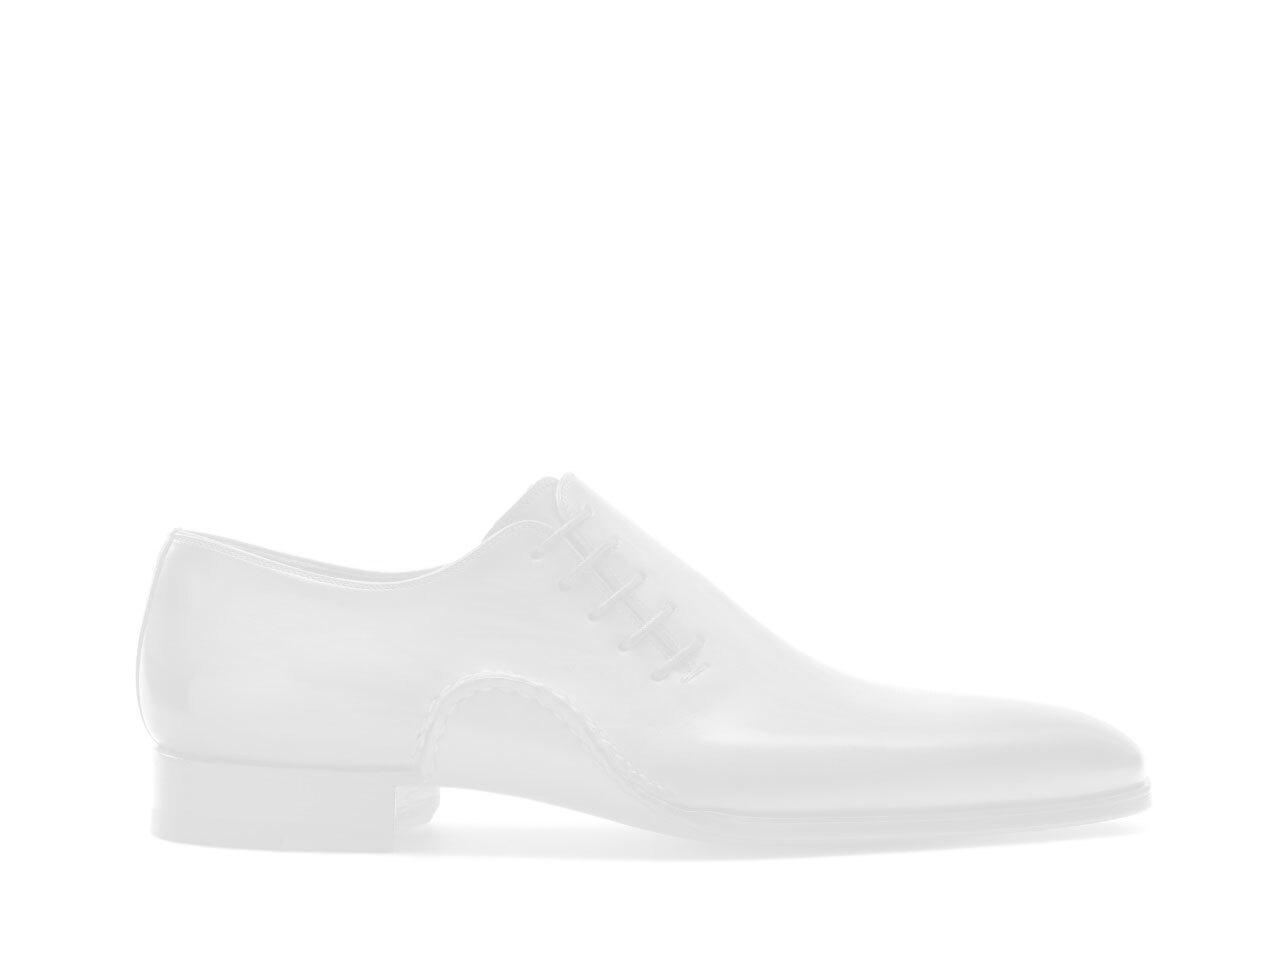 Sole of the Magnanni Nicola Cuero and Grey Men's Single Monk Strap Shoes